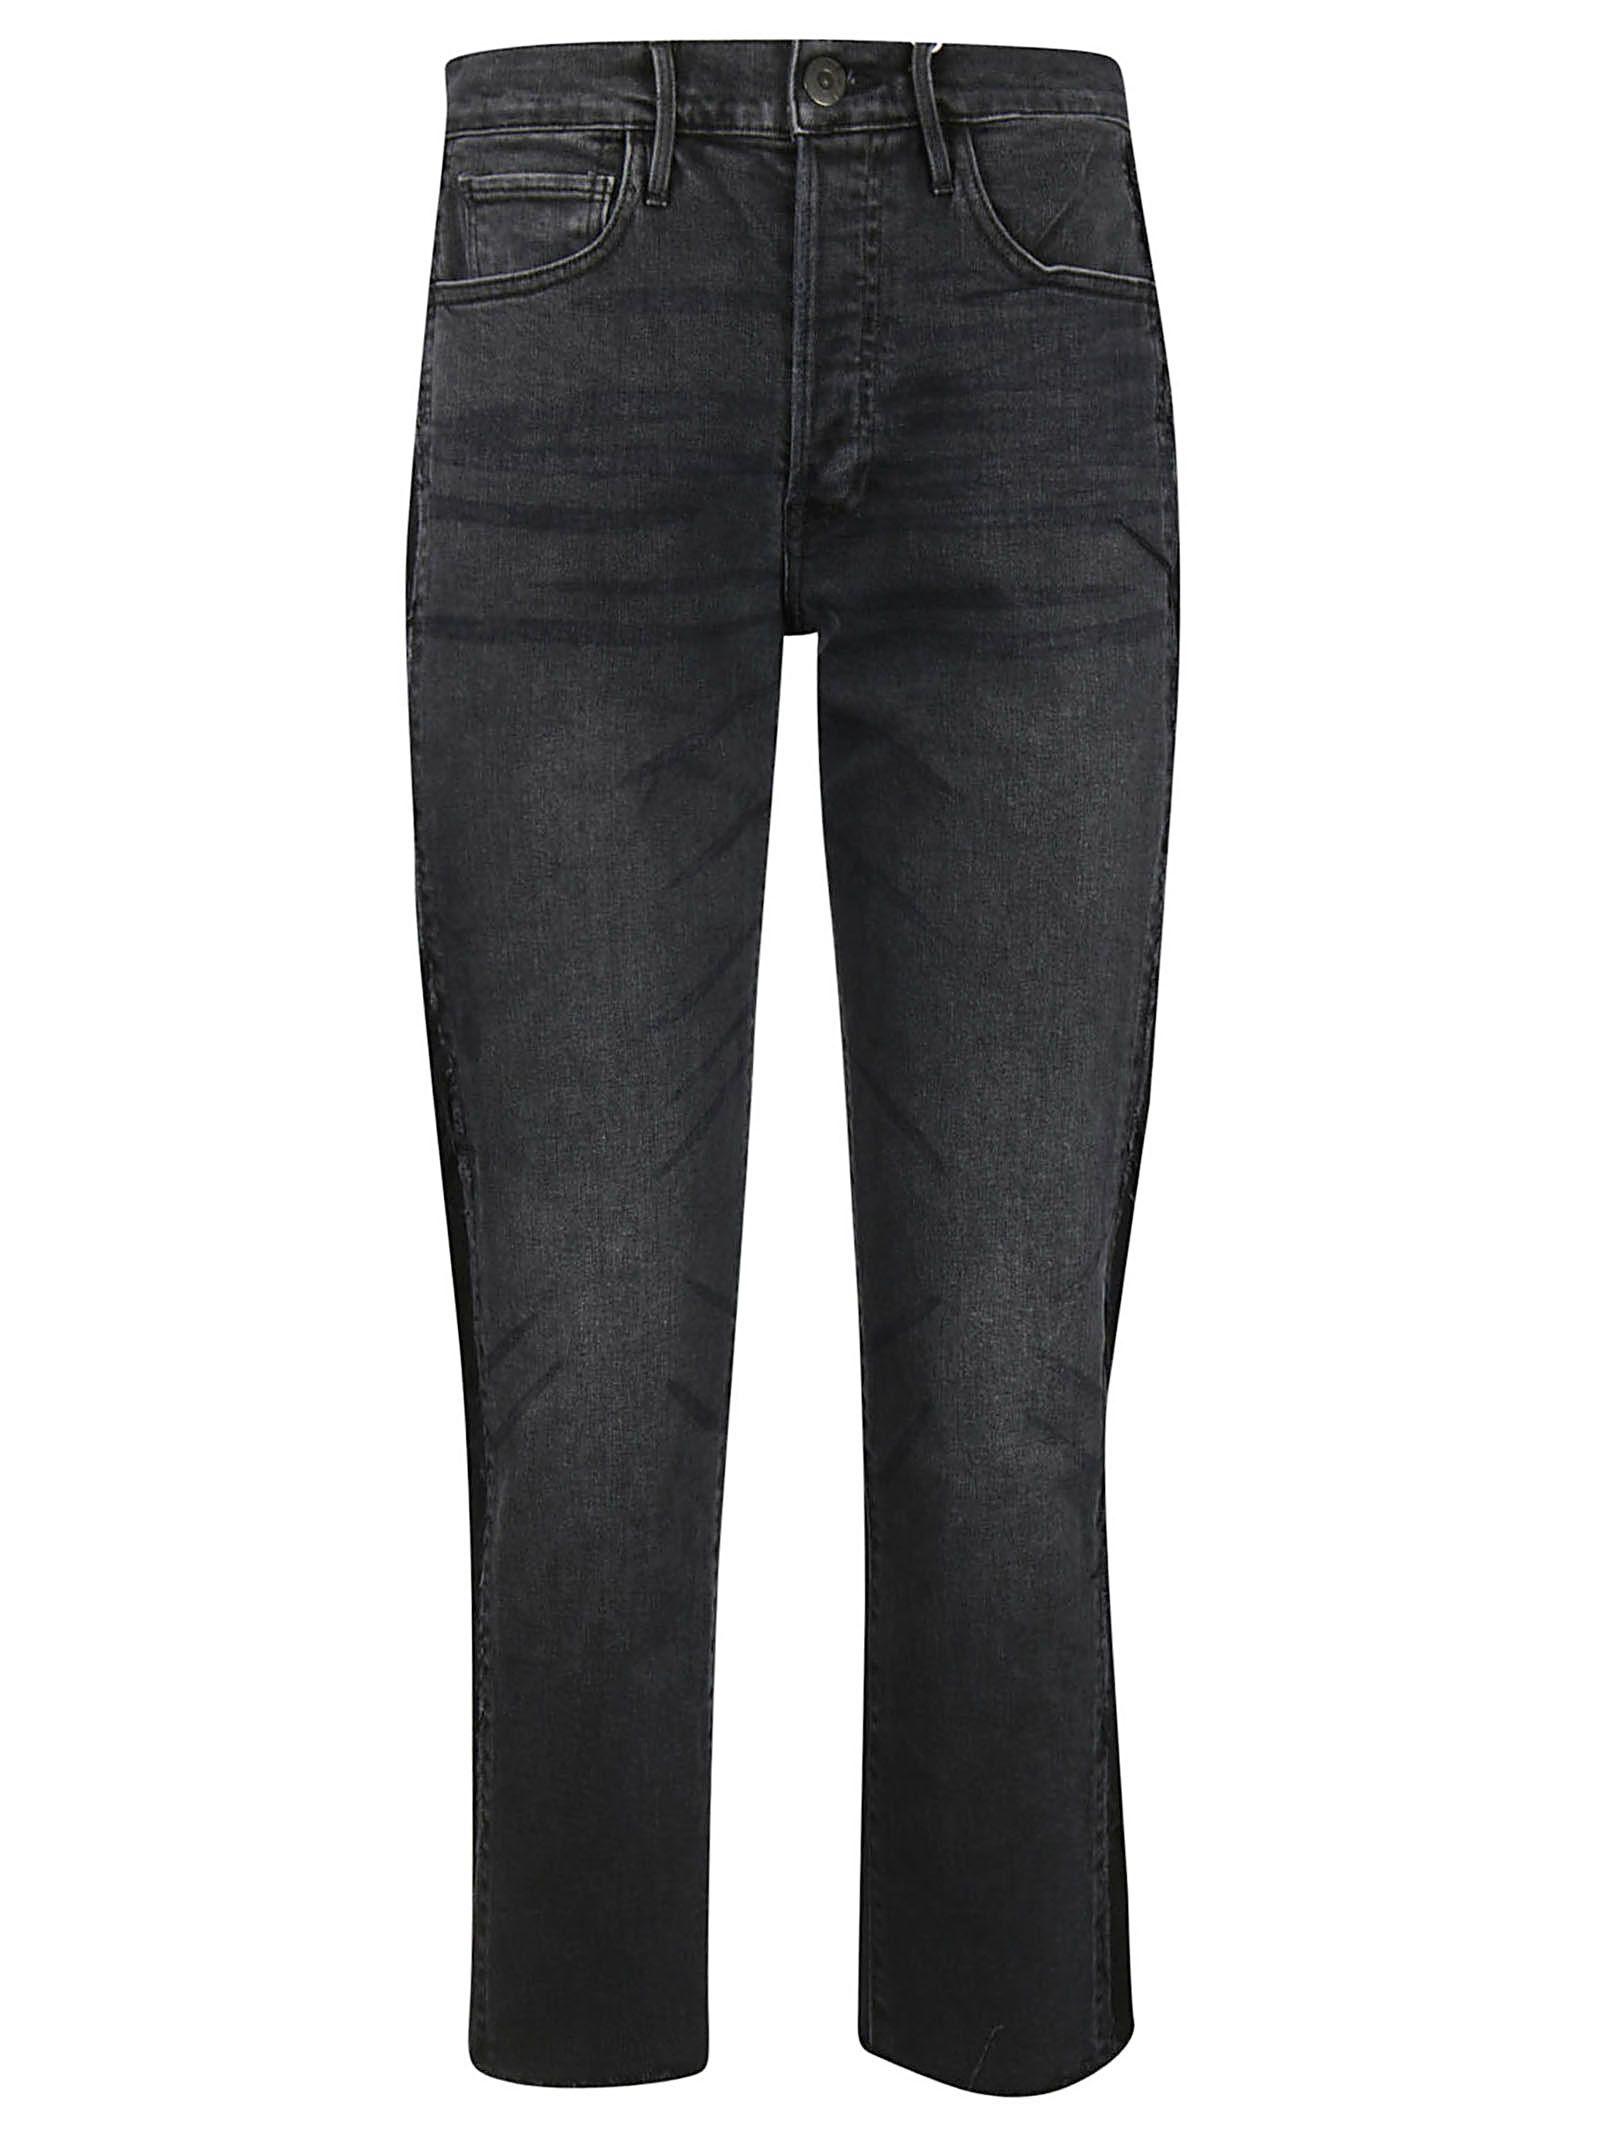 3x1 Cora Crop Jeans